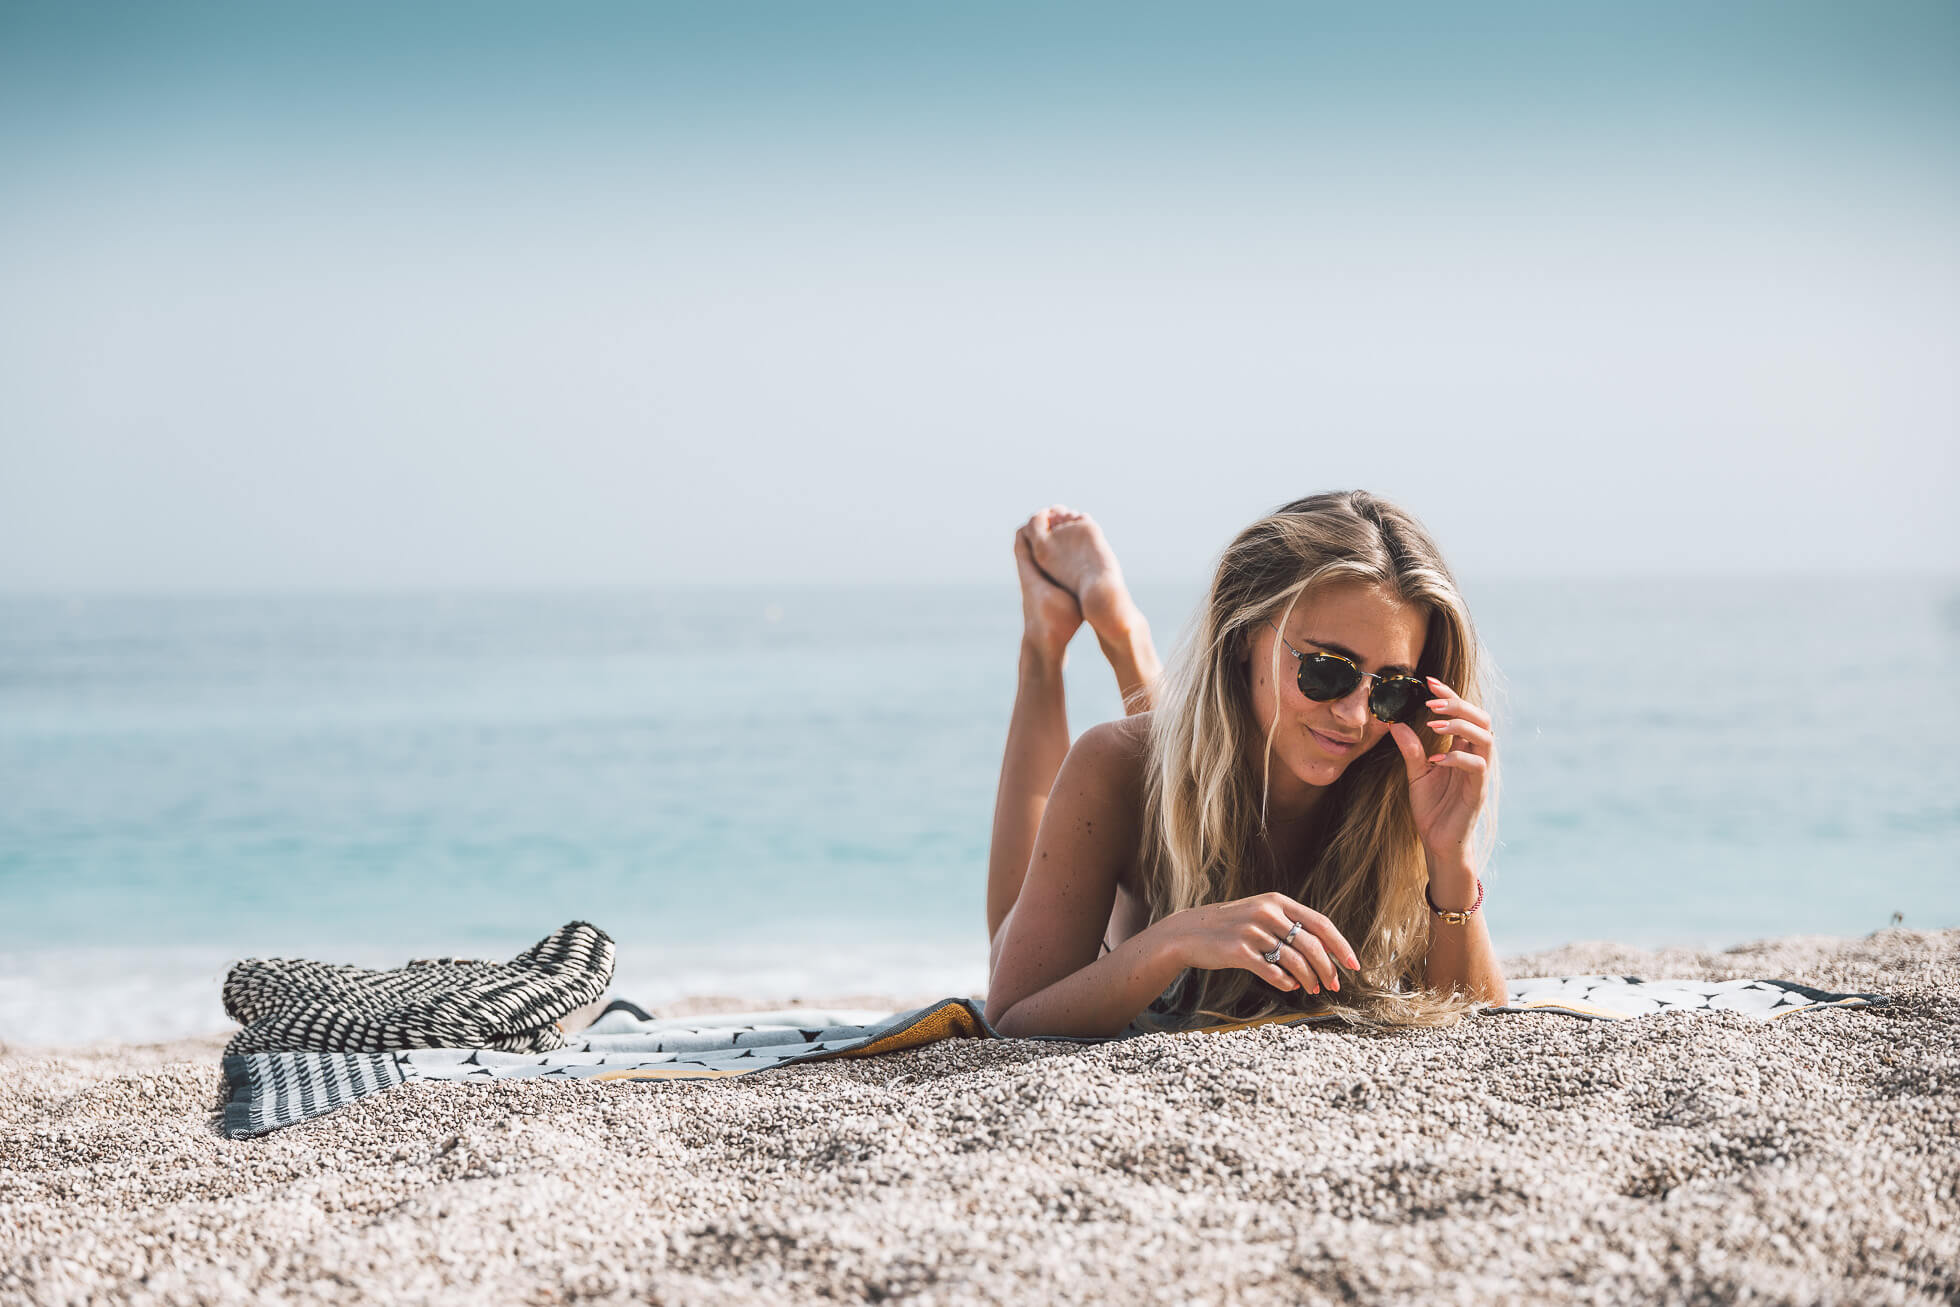 janni-deler-beach-monacoL1040927